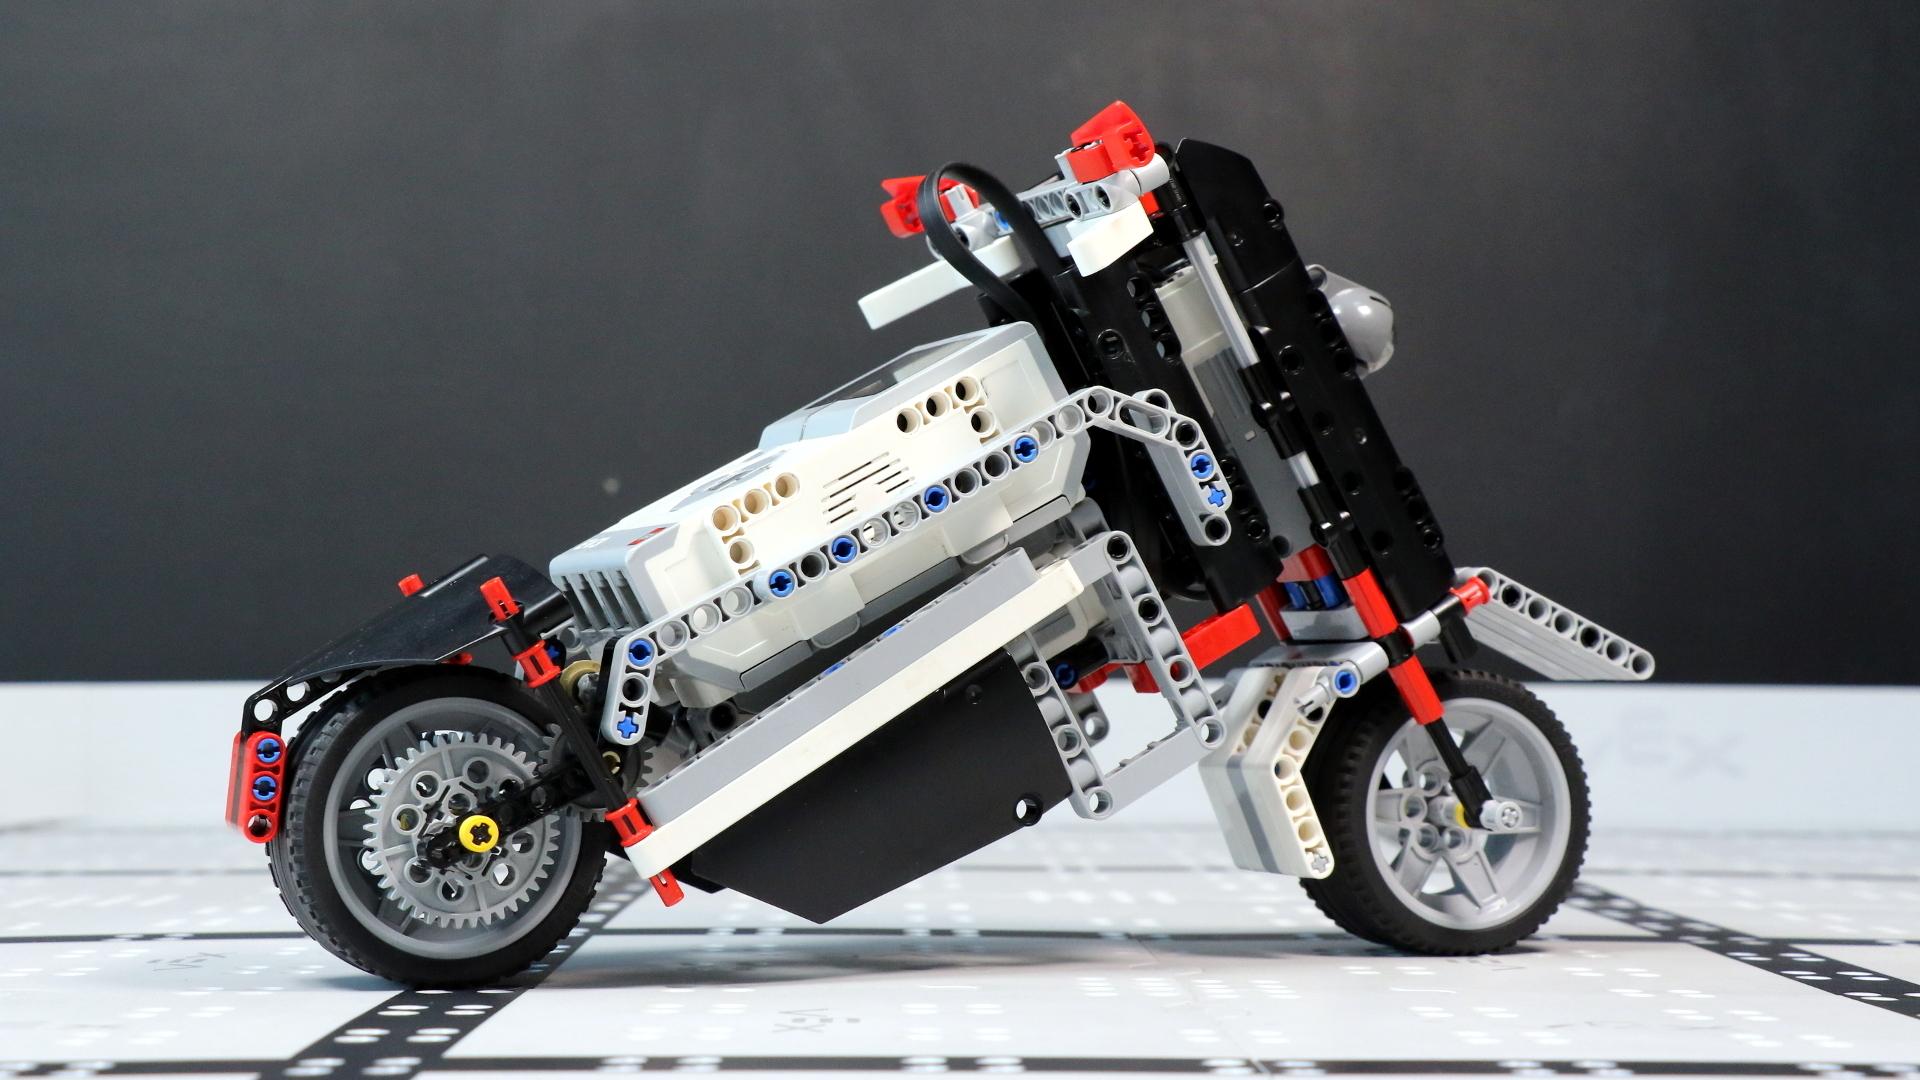 Ninja Motorcycle Ev3 Robot